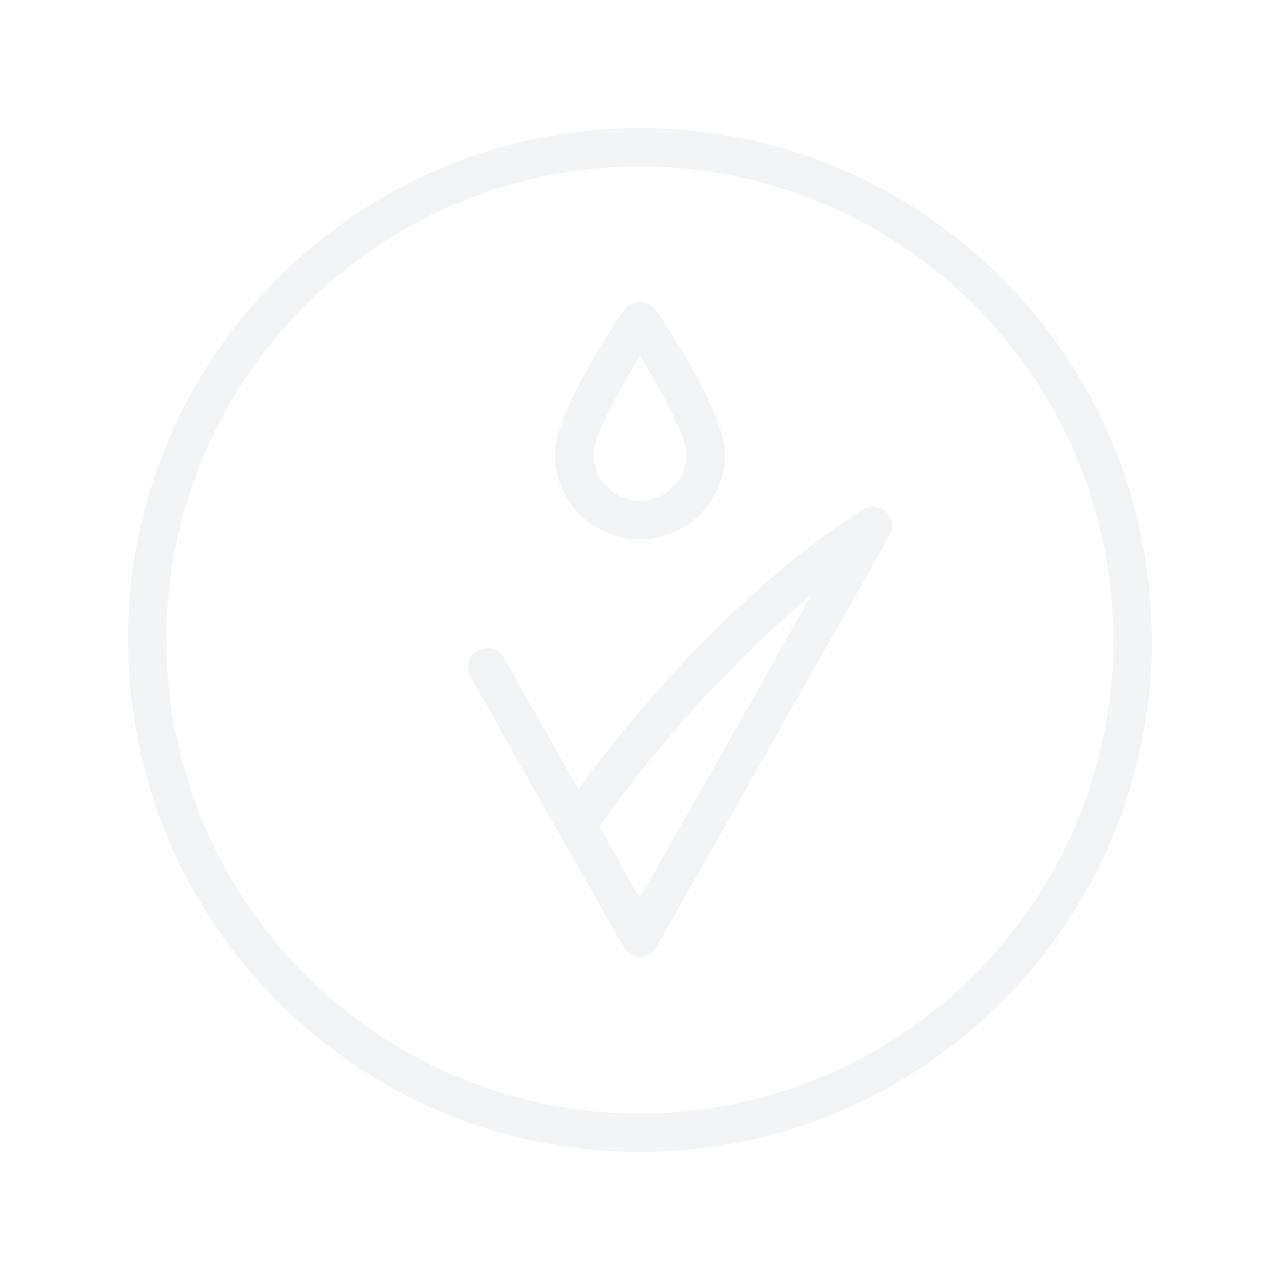 BATISTE Dry Shampoo Bare сухой шампунь 200ml